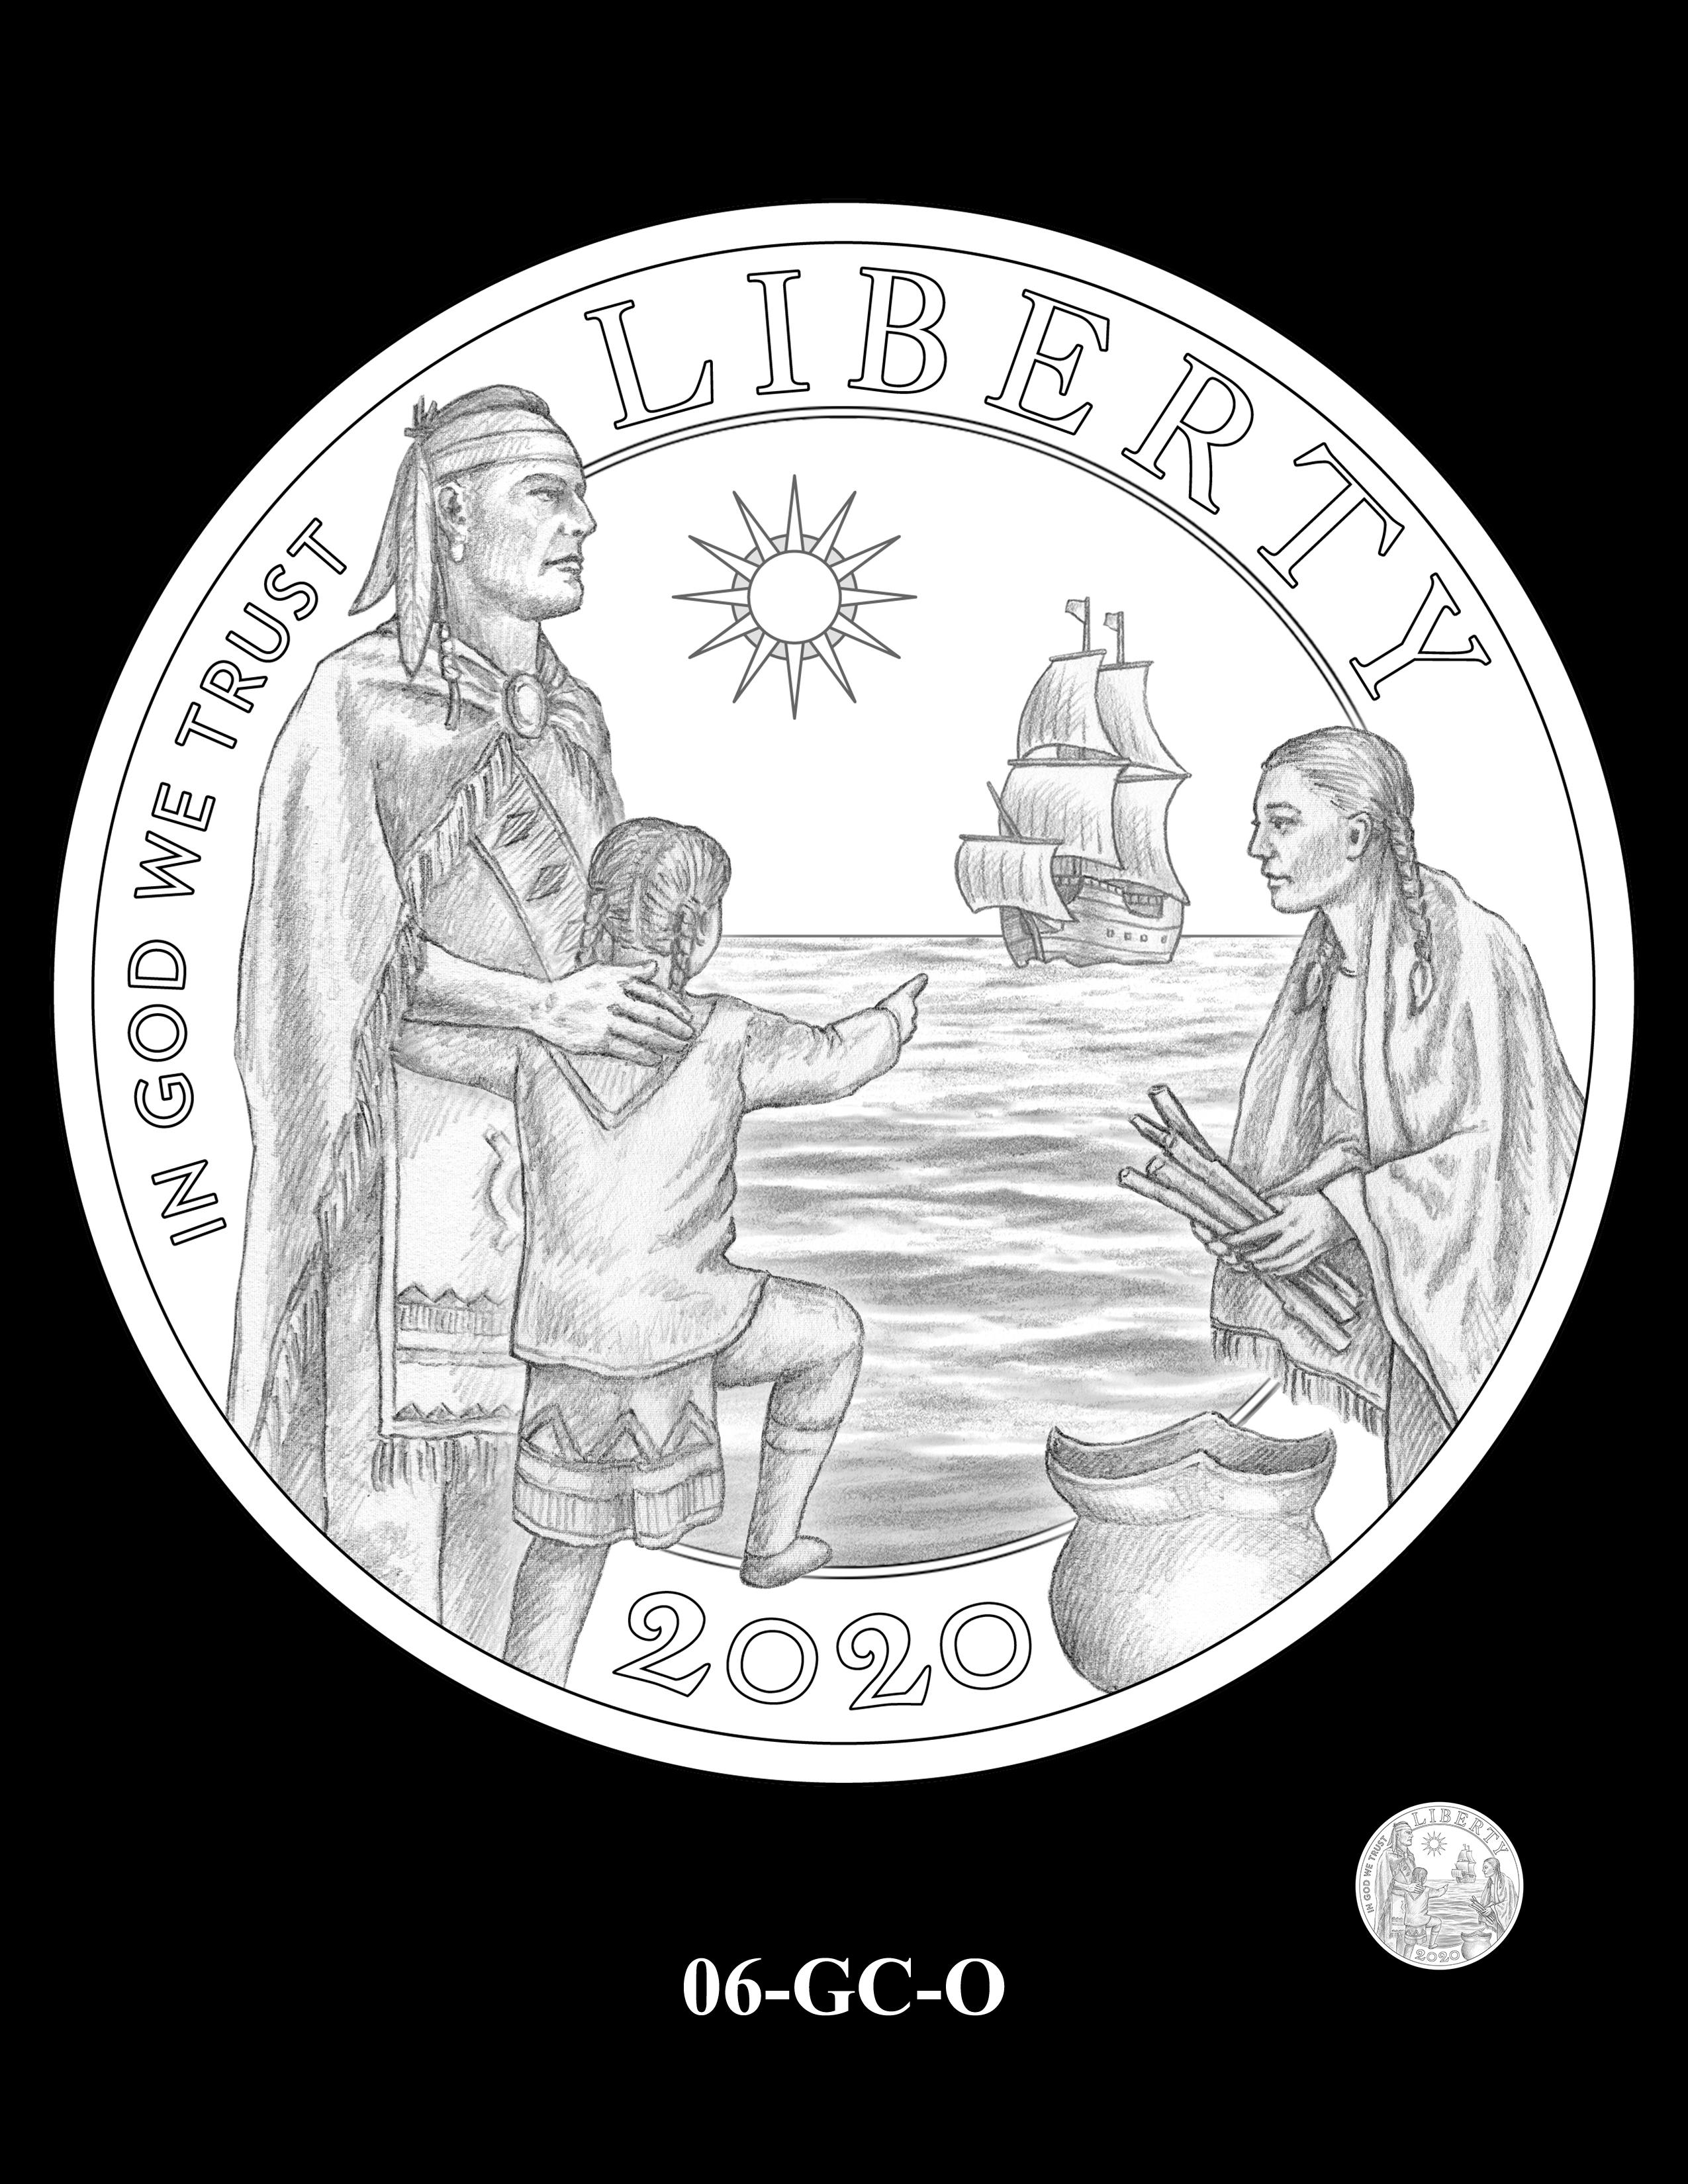 06-GC-O - 2020 Mayflower 400th Anniversary 24K Gold Coin & Silver Medal Program